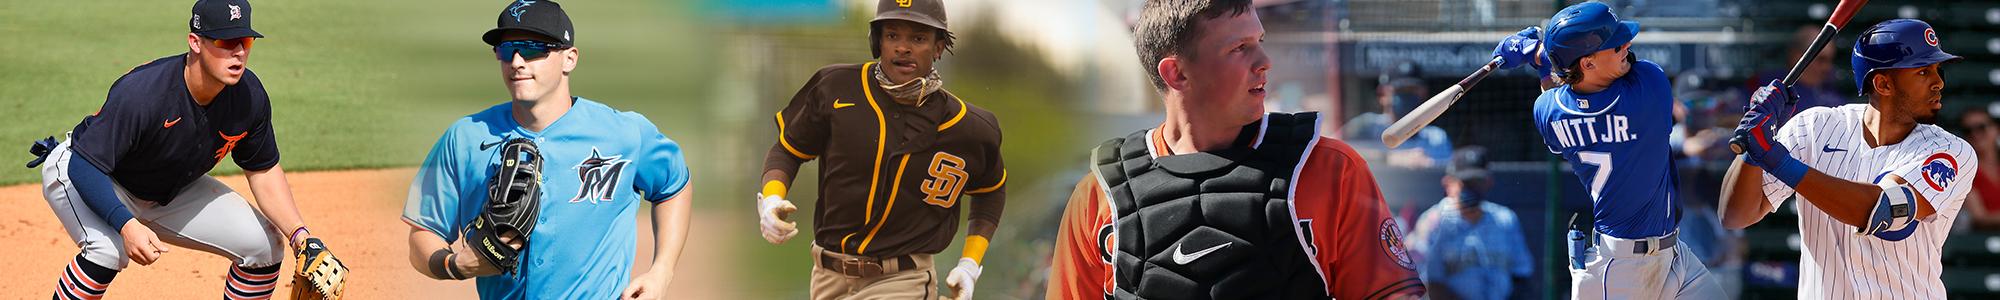 Just Baseball Prospects